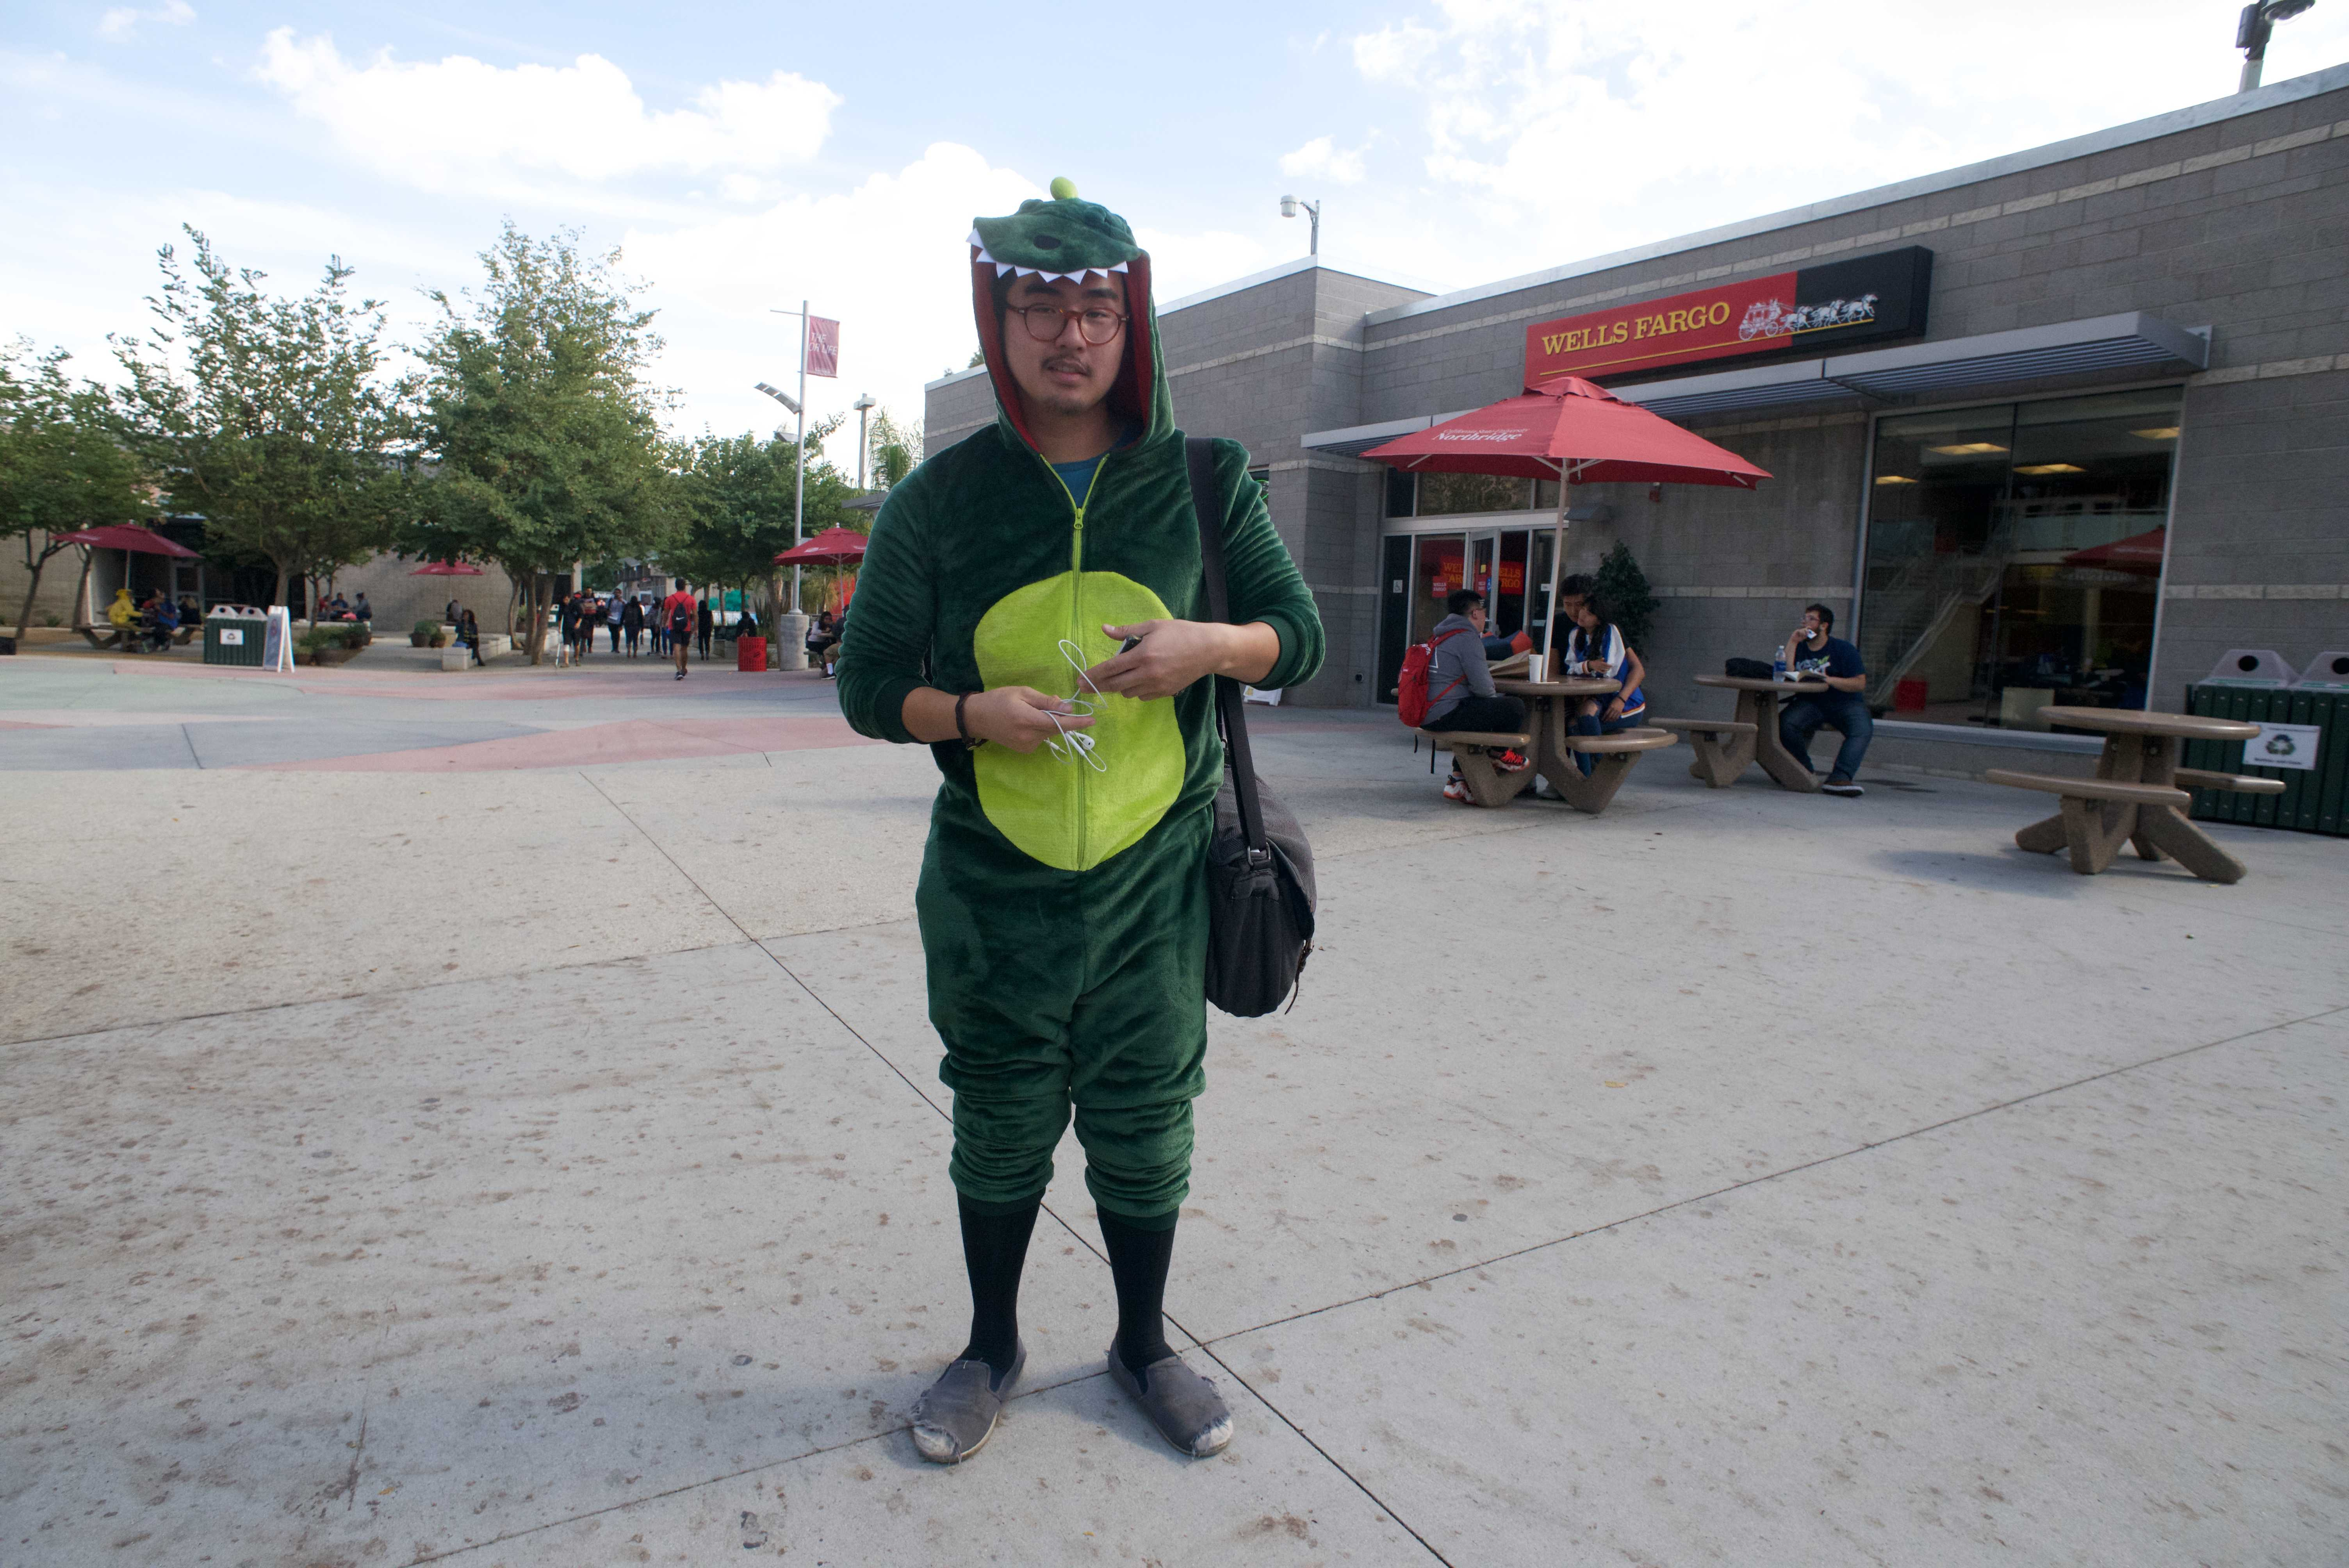 Student dressed as dinosaur